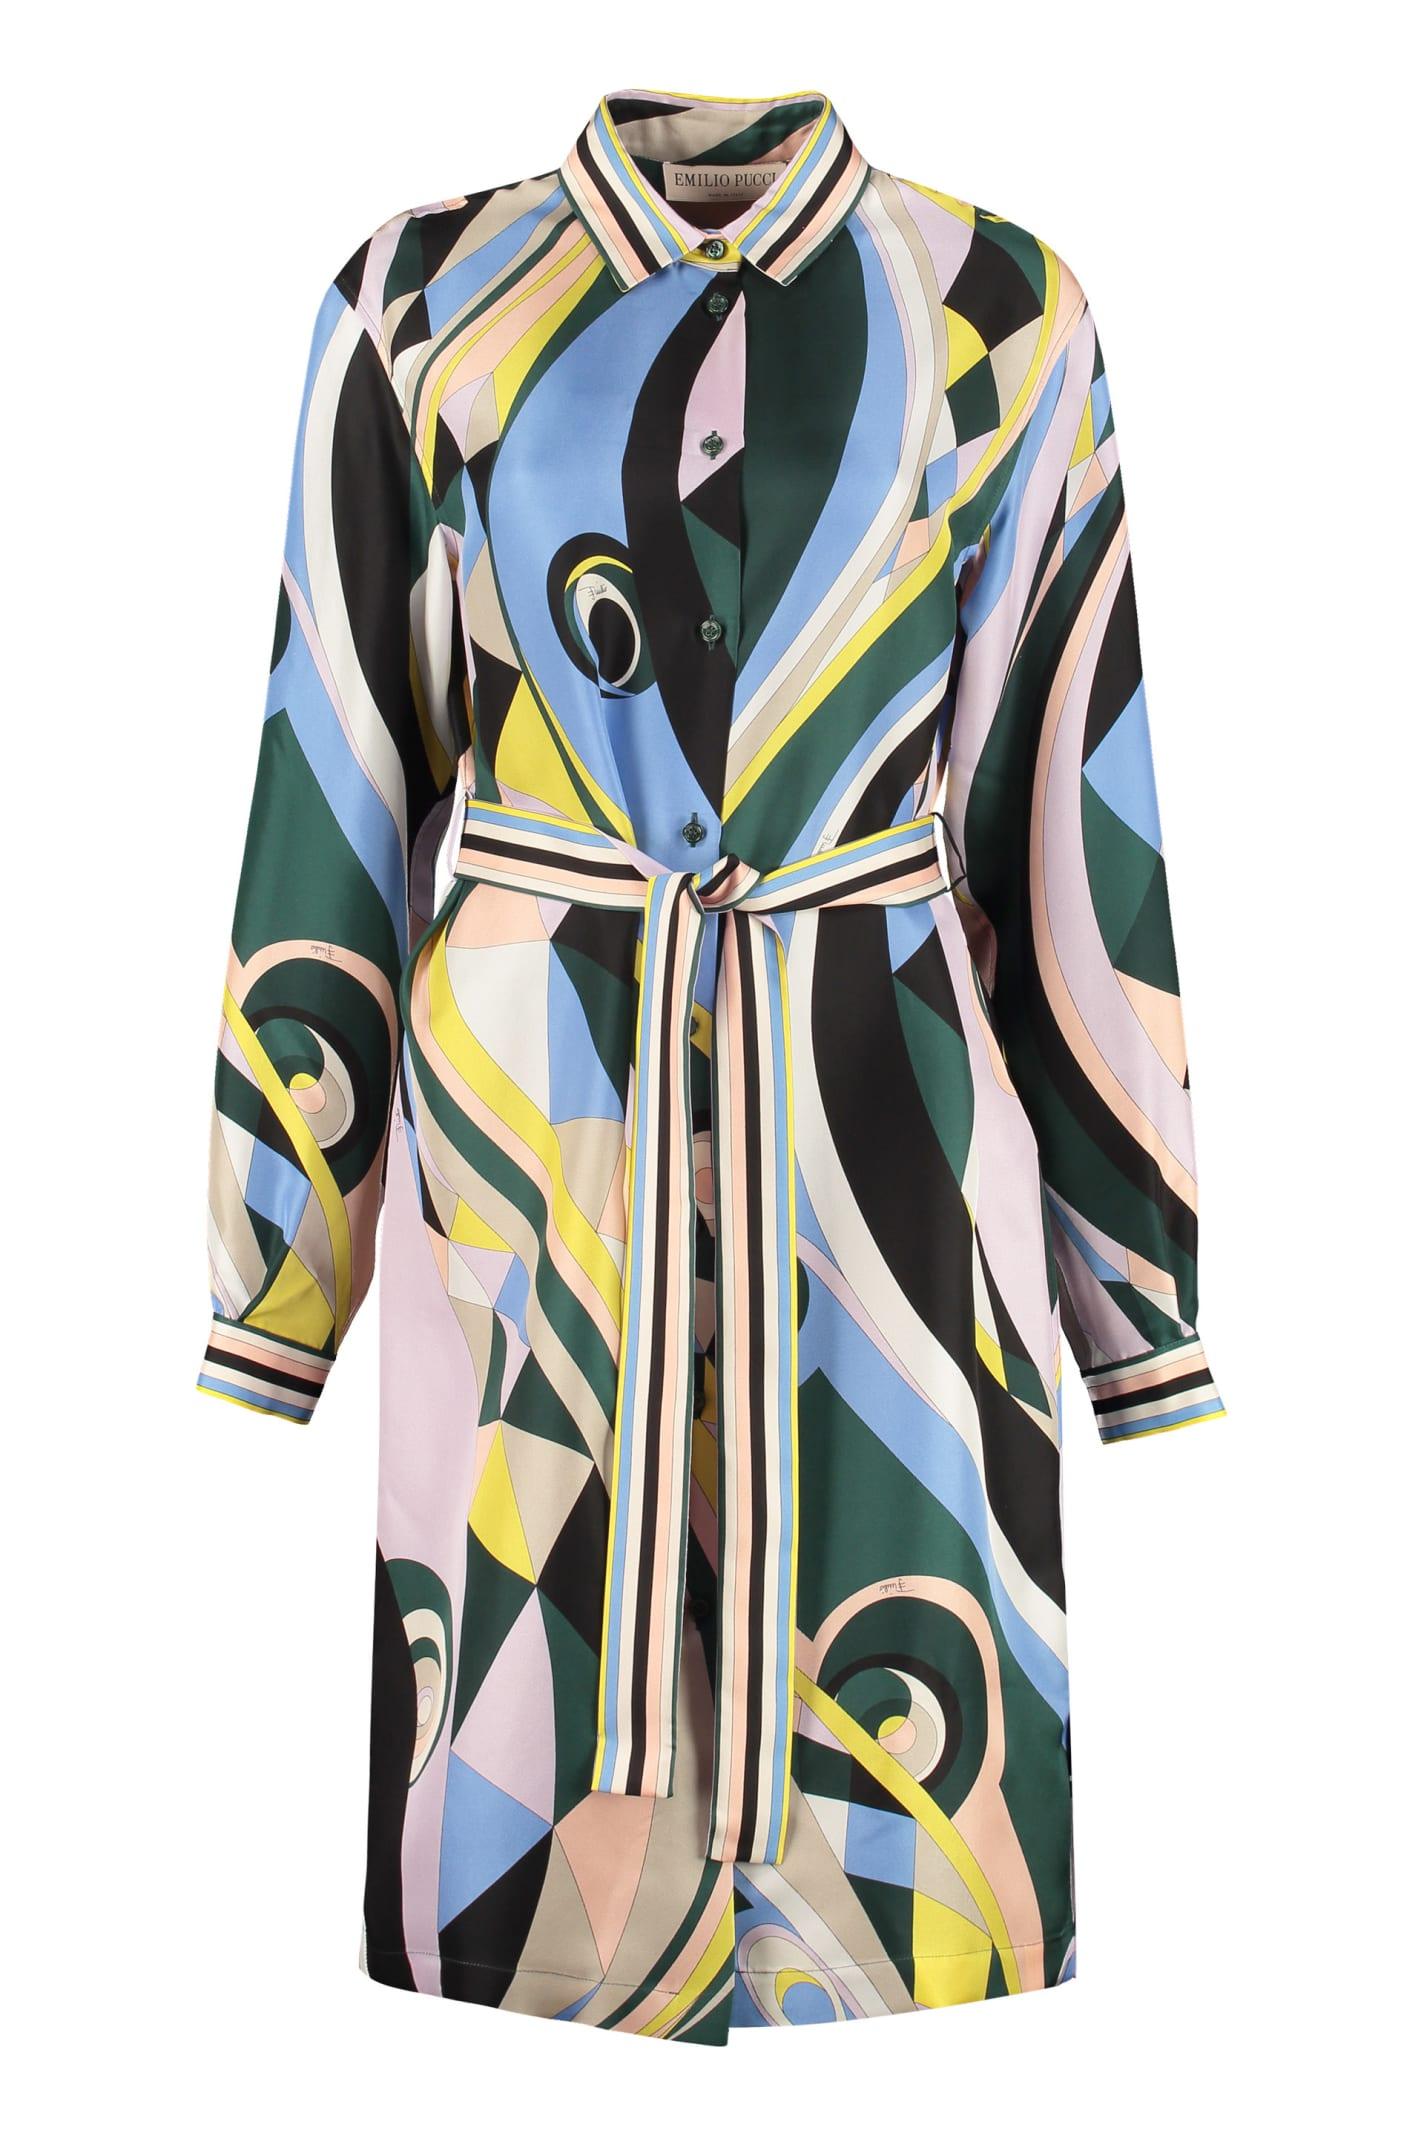 Emilio Pucci Printed Silk Shirt Dress